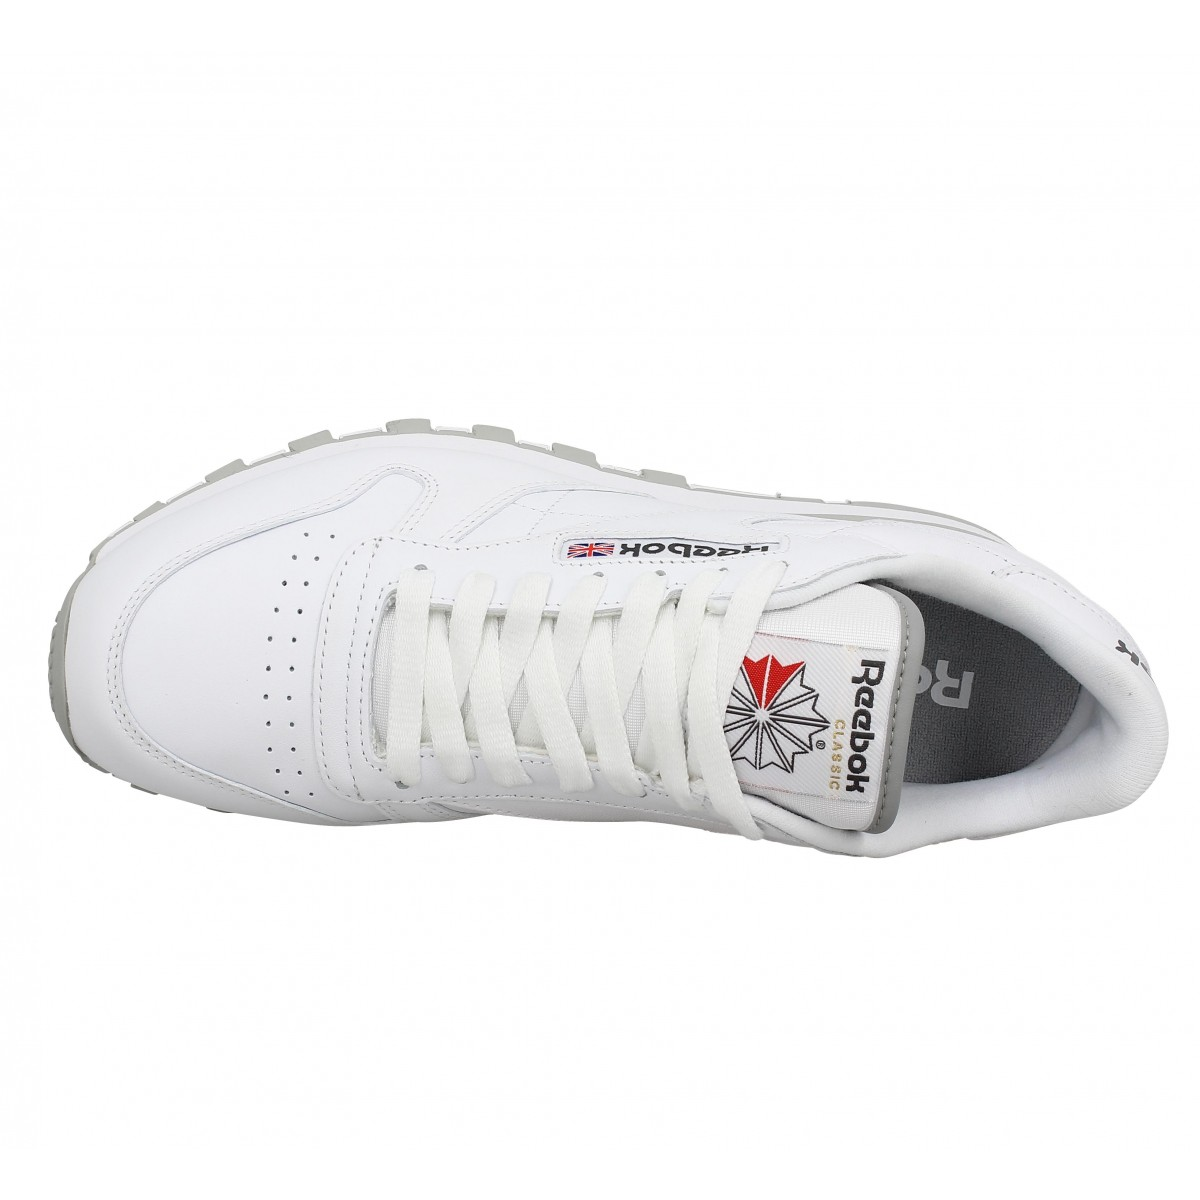 f773b3f088e6 reebok cuir homme Reebok classic cuir homme blanc | Fanny chaussures;